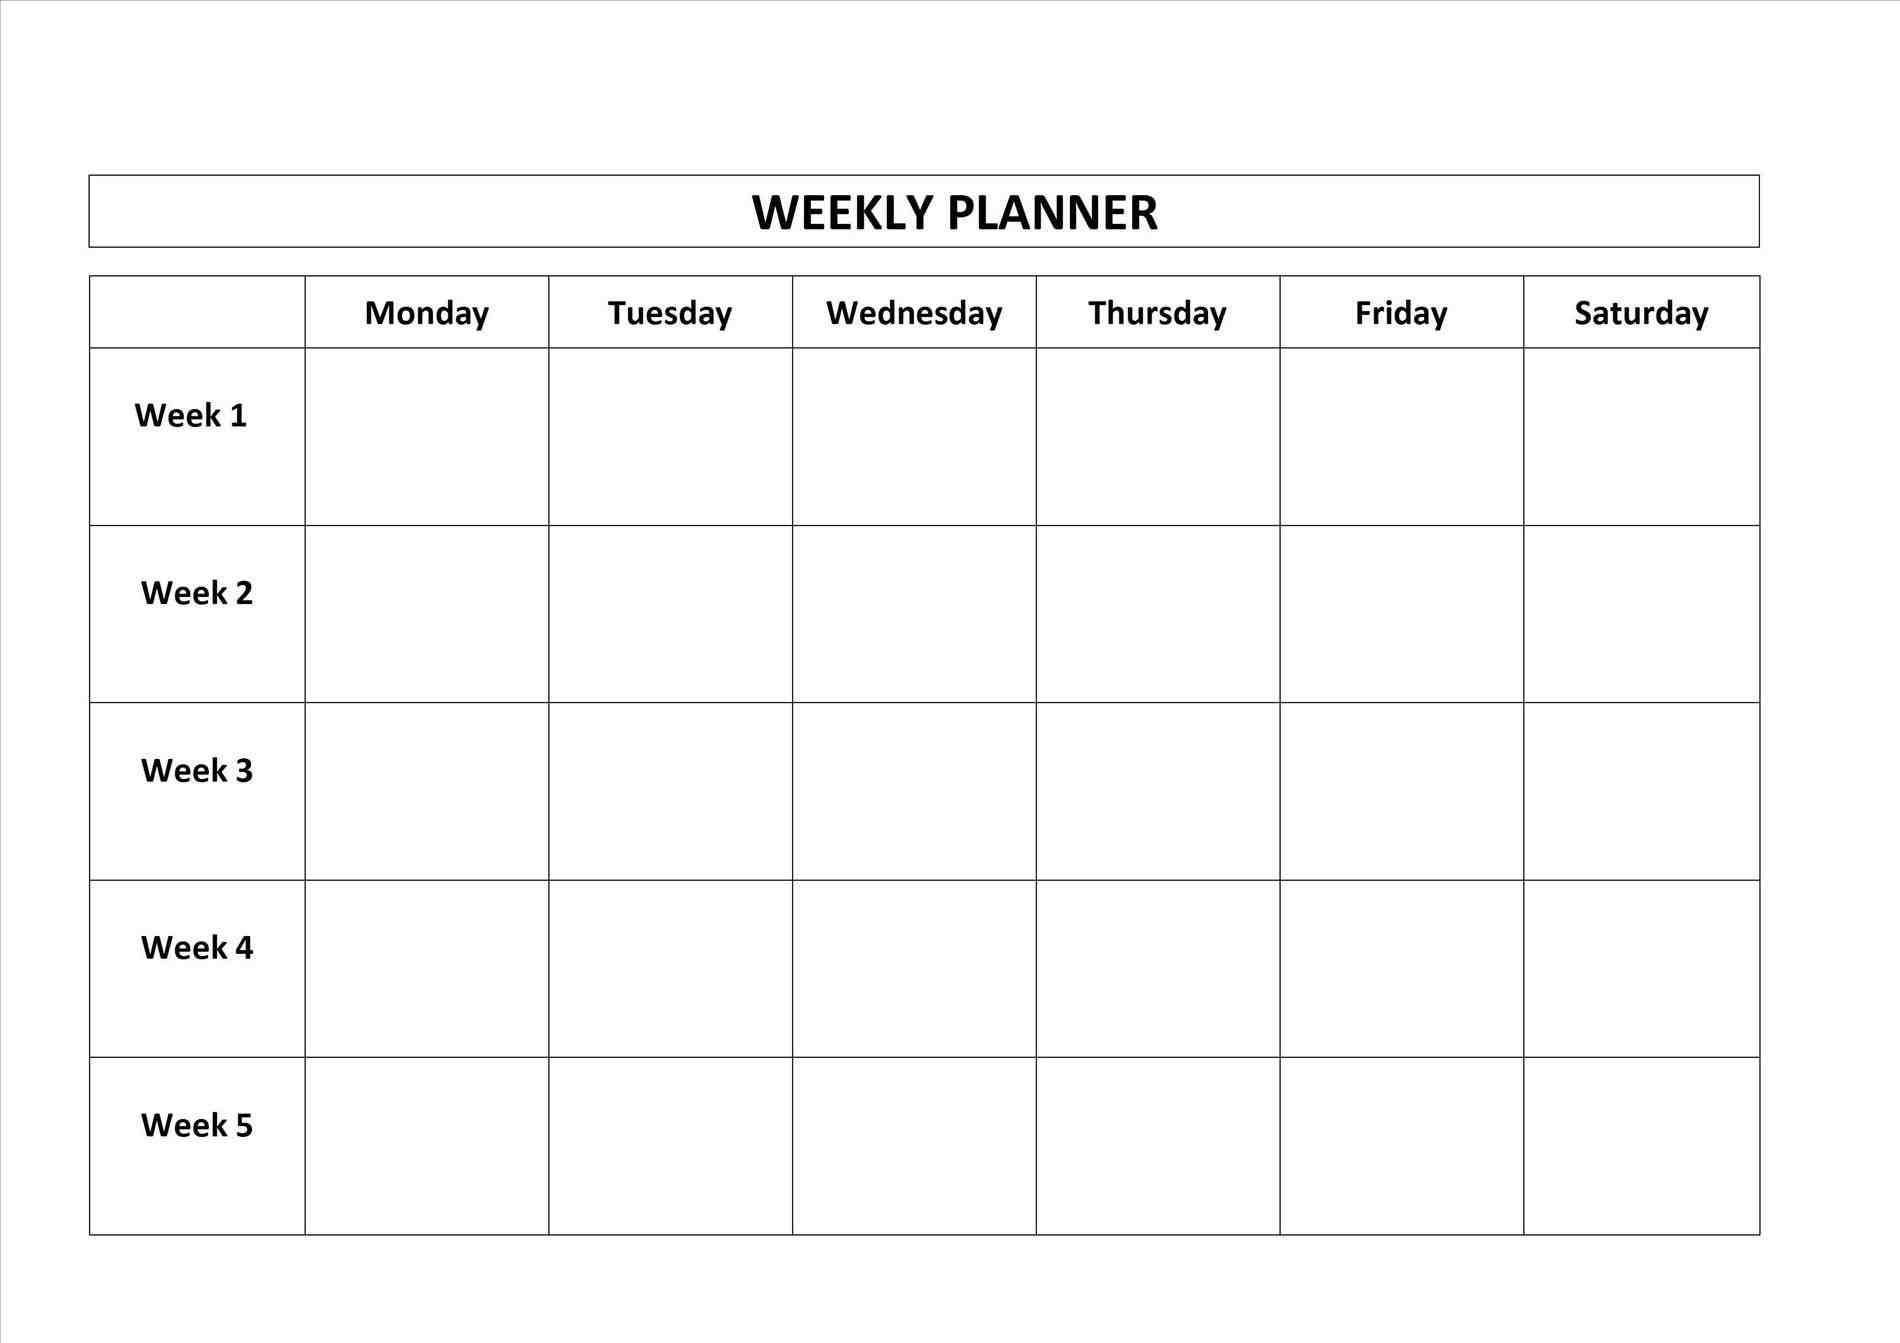 Monday Through Friday Blank Calendar Template - Calendar Inspiration Design